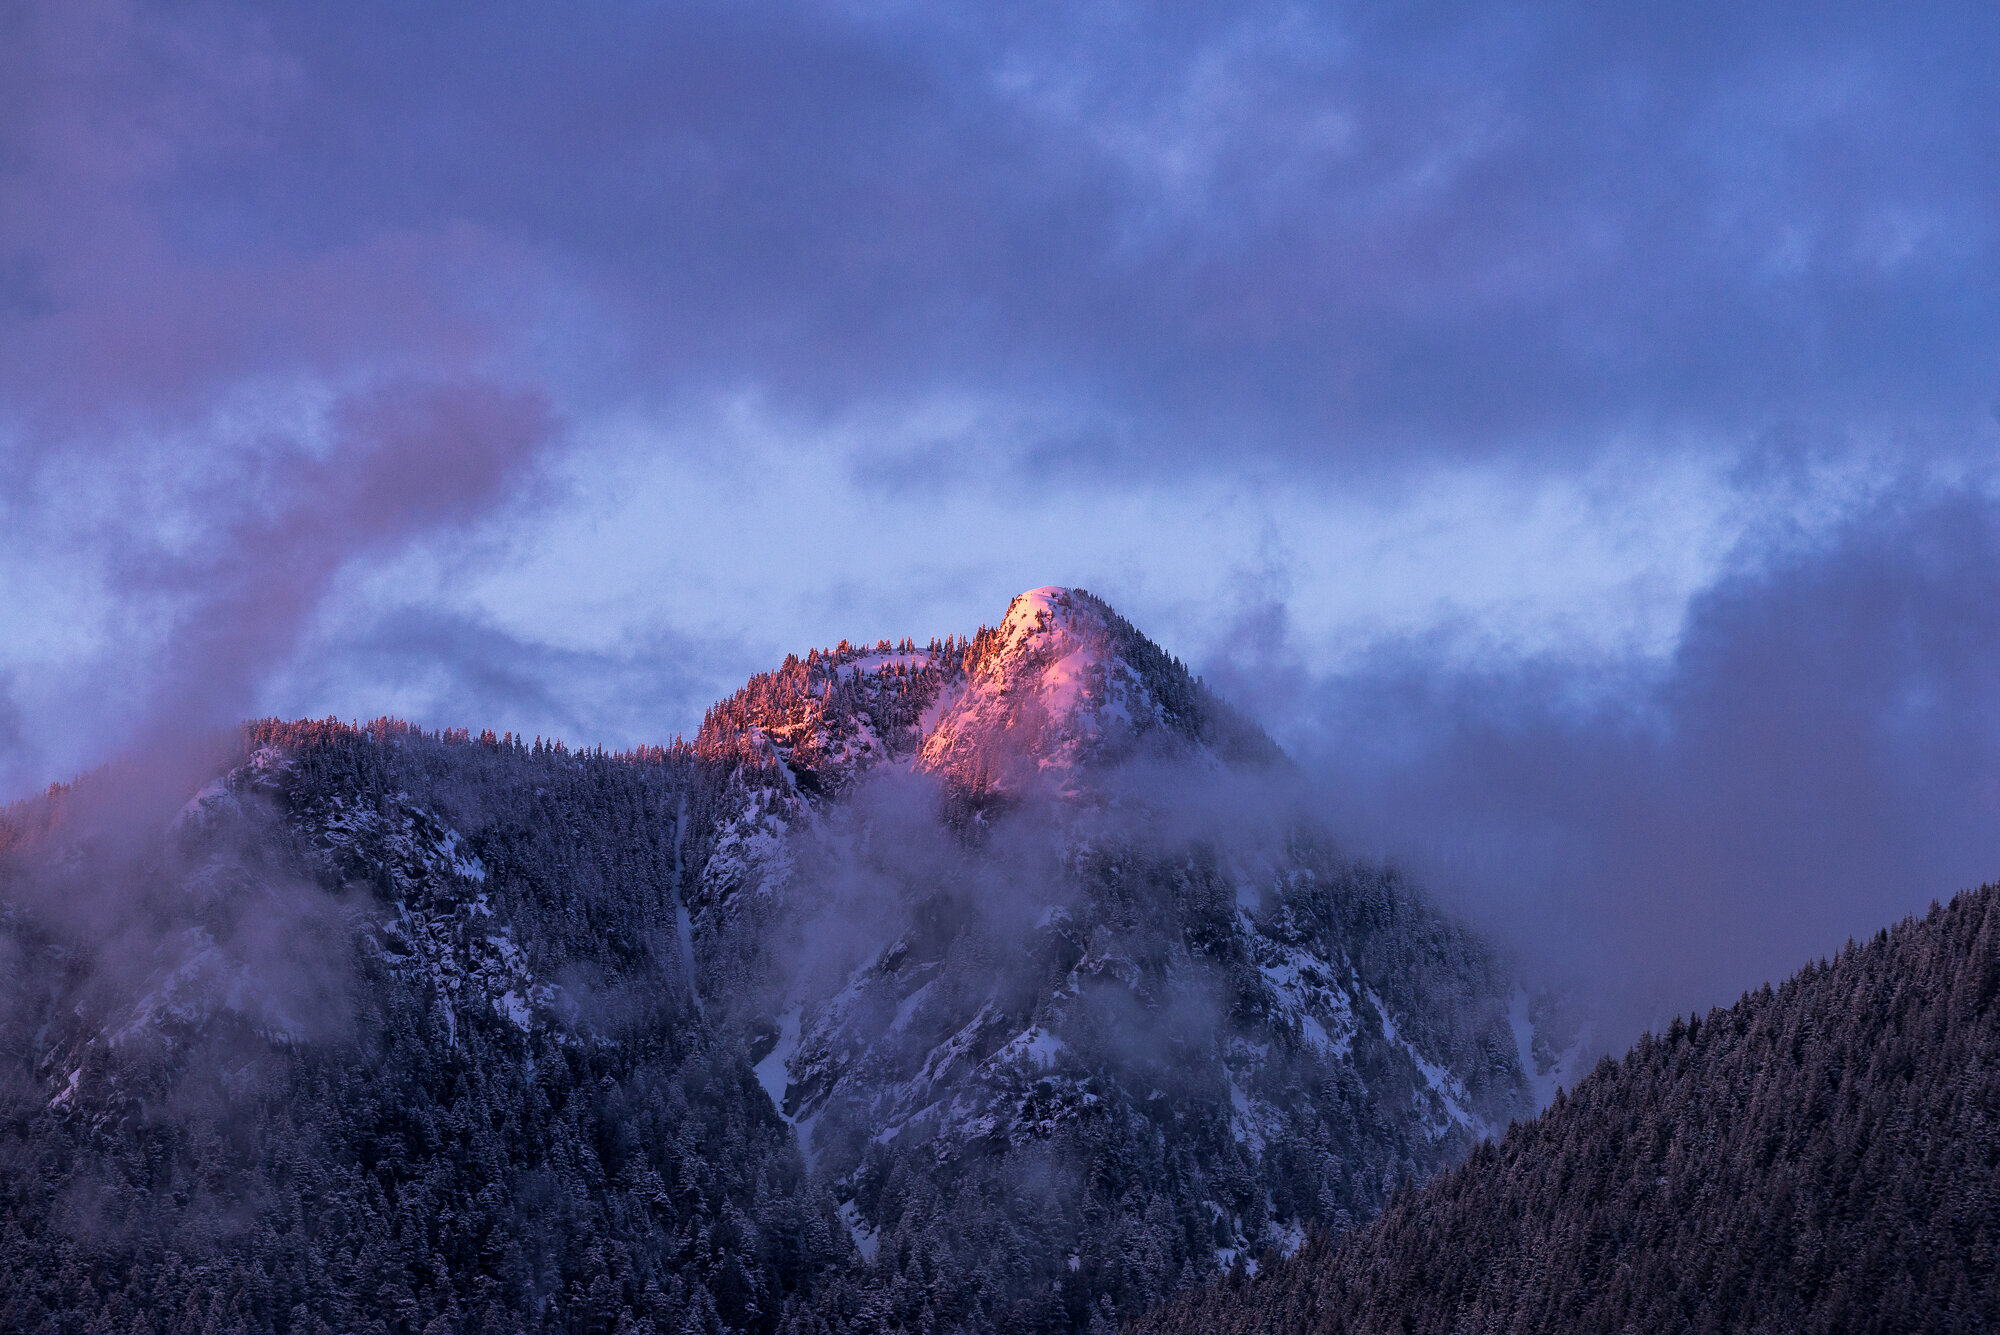 British Columbia Mountains: 'Crown Mountain Alpenglow'